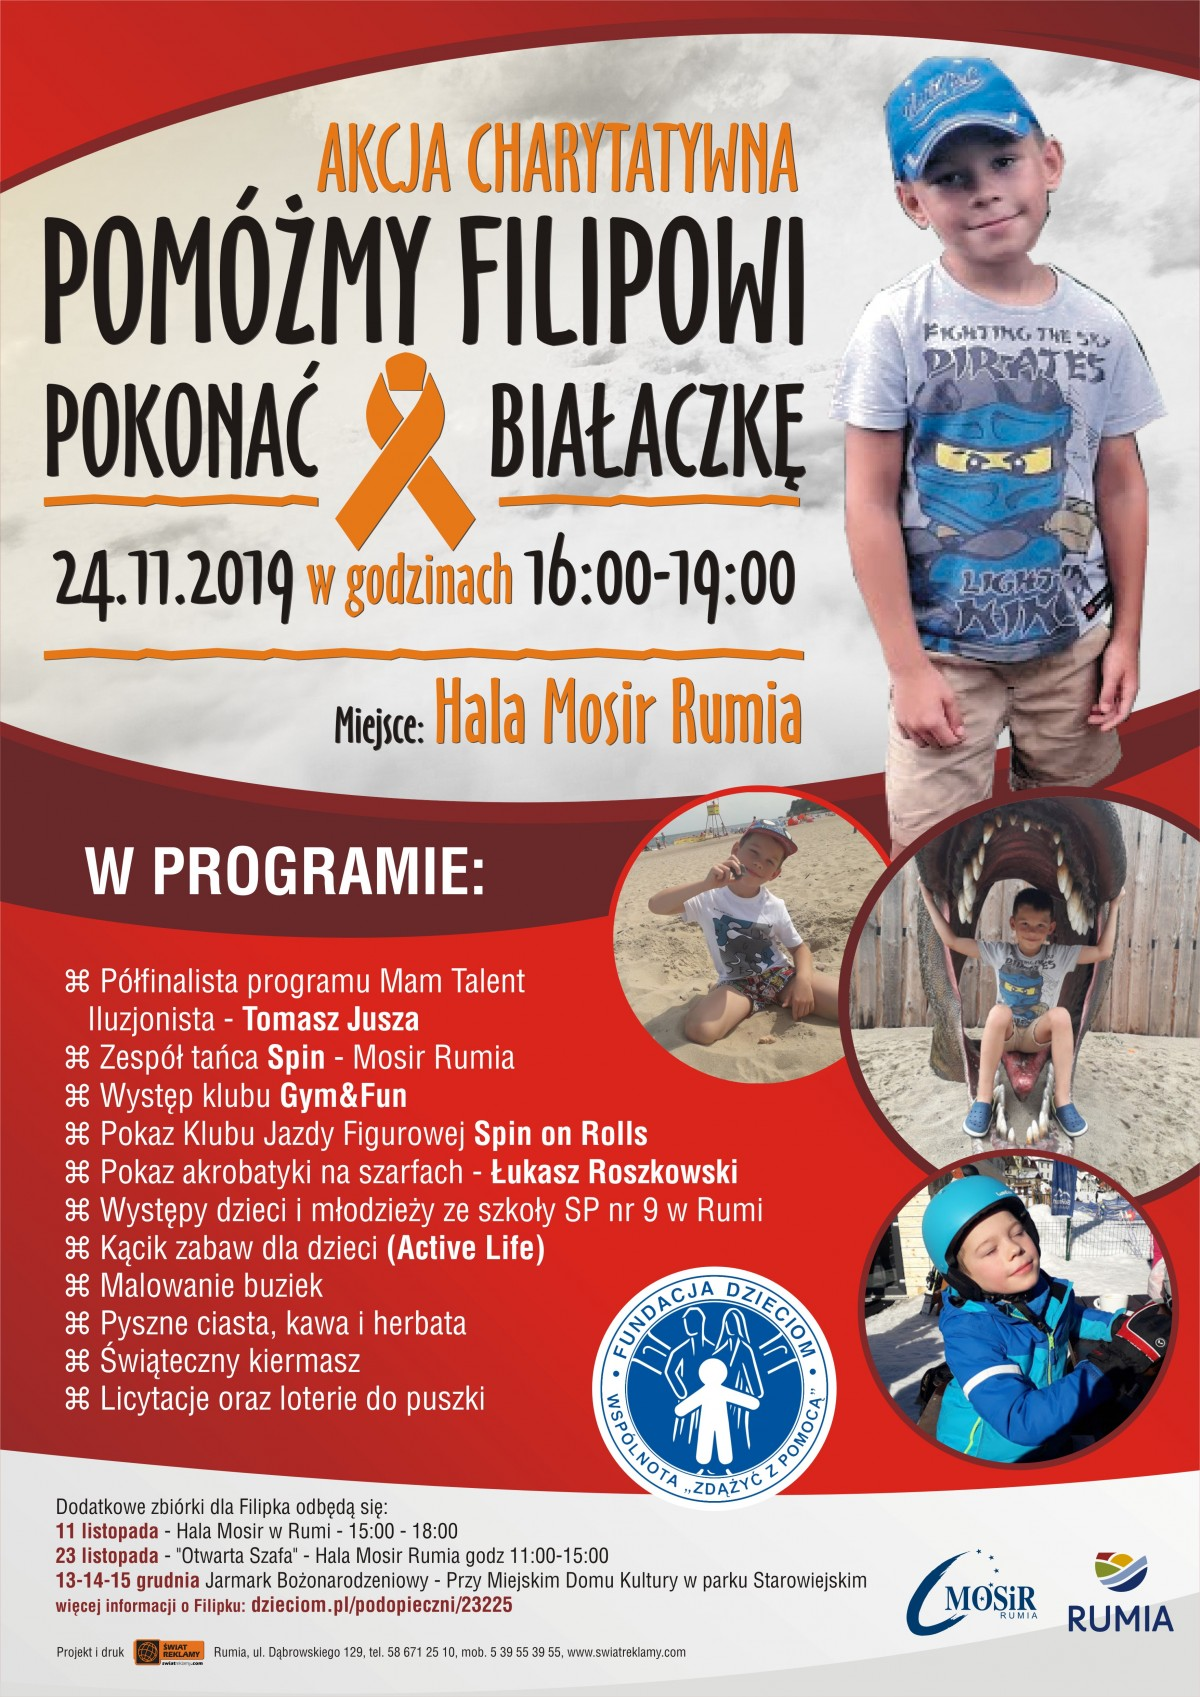 Akcja charytatywna dla chorego Filipa – pokazy, koncerty i kwesta